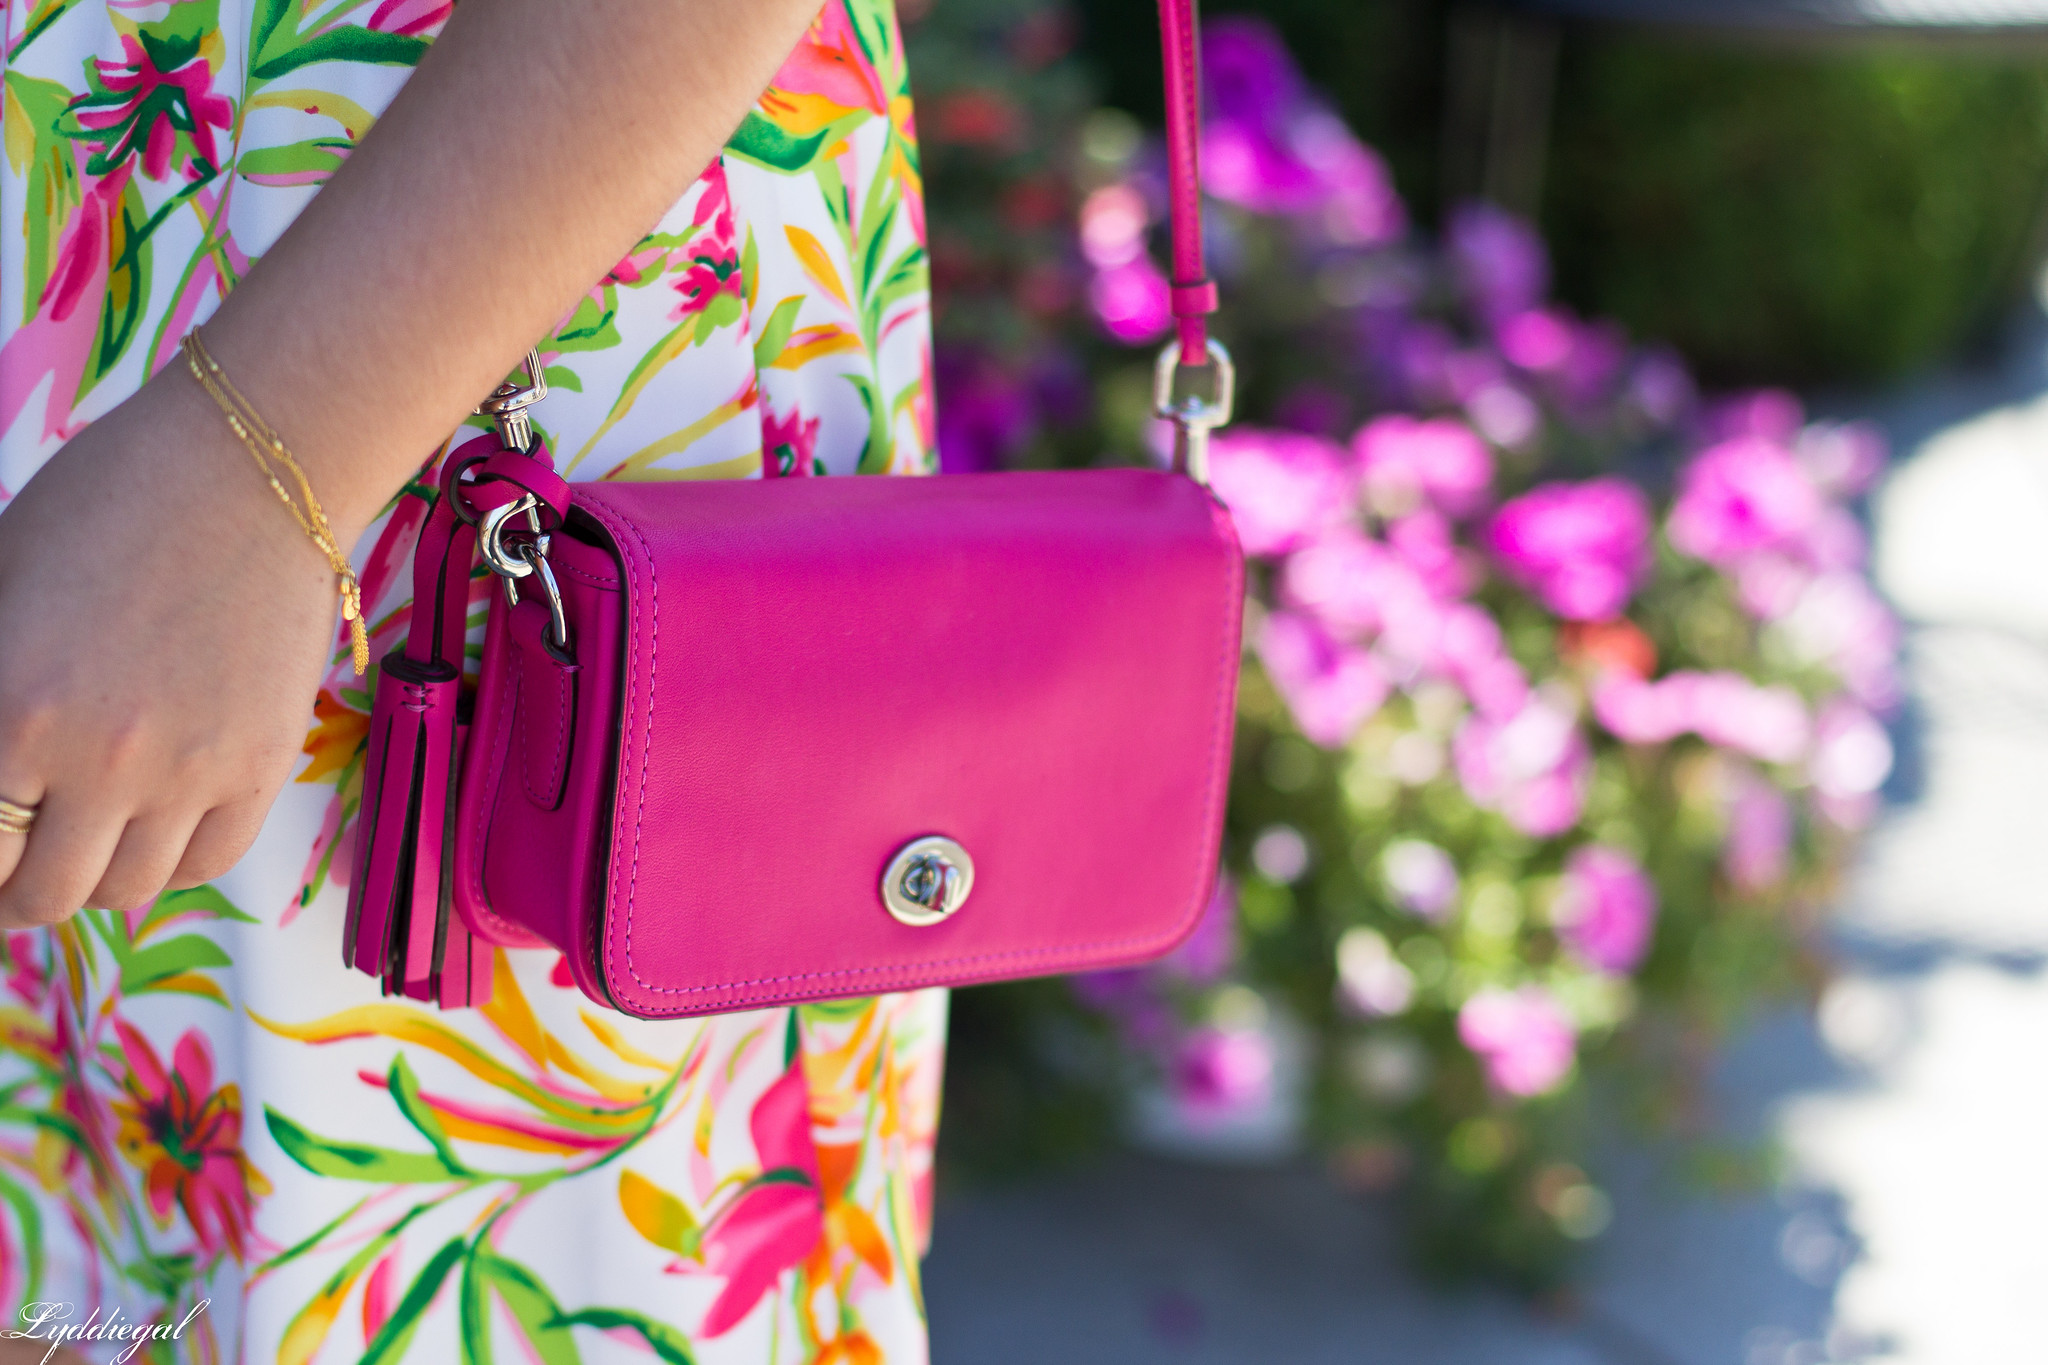 floral cami dress, pink coach bag, platform espadrilles-3.jpg